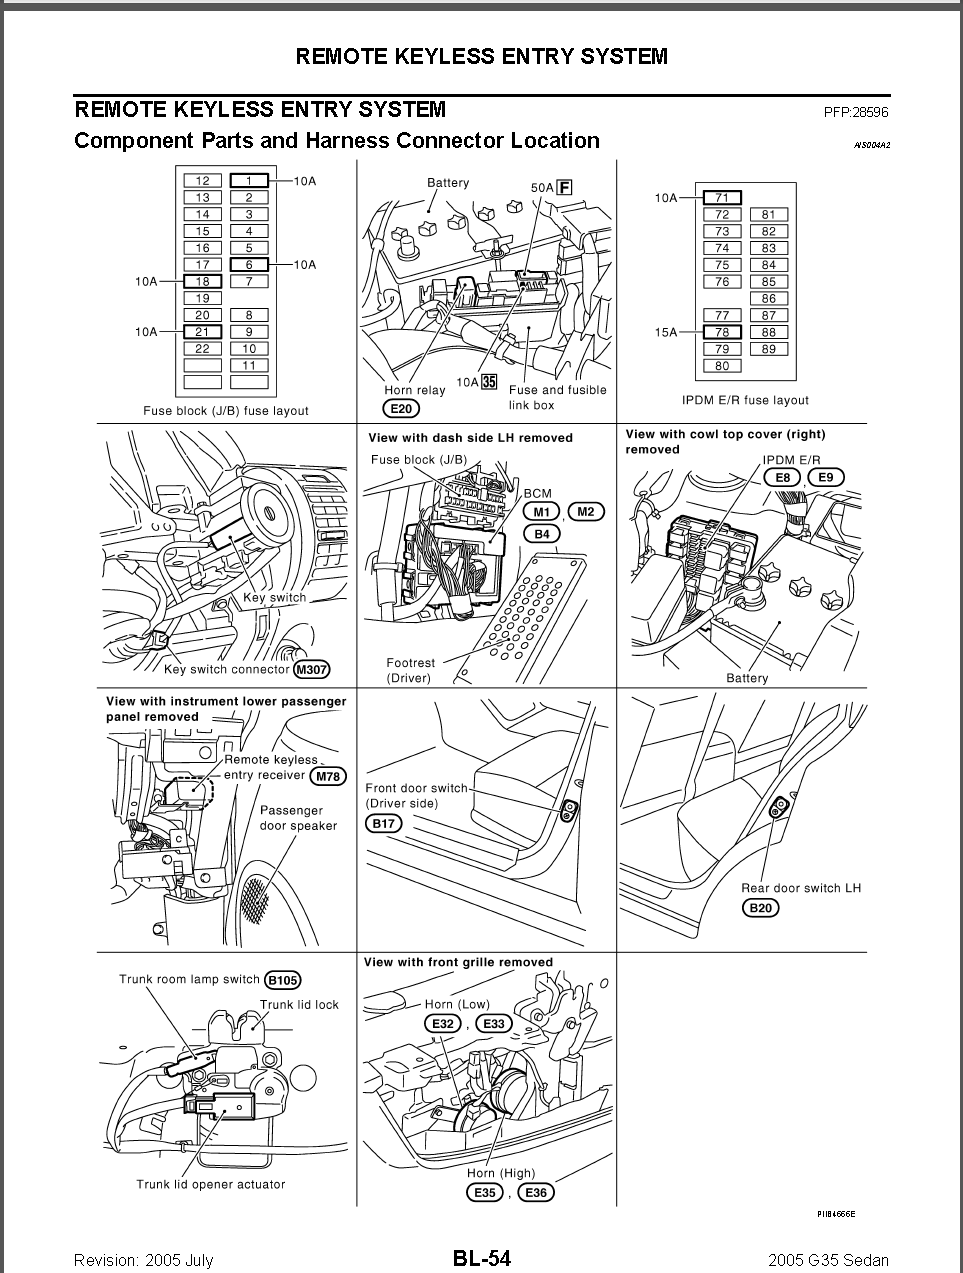 1997 Infiniti Qx4 Fuse Box Location : Infiniti qx fuse box diagram q